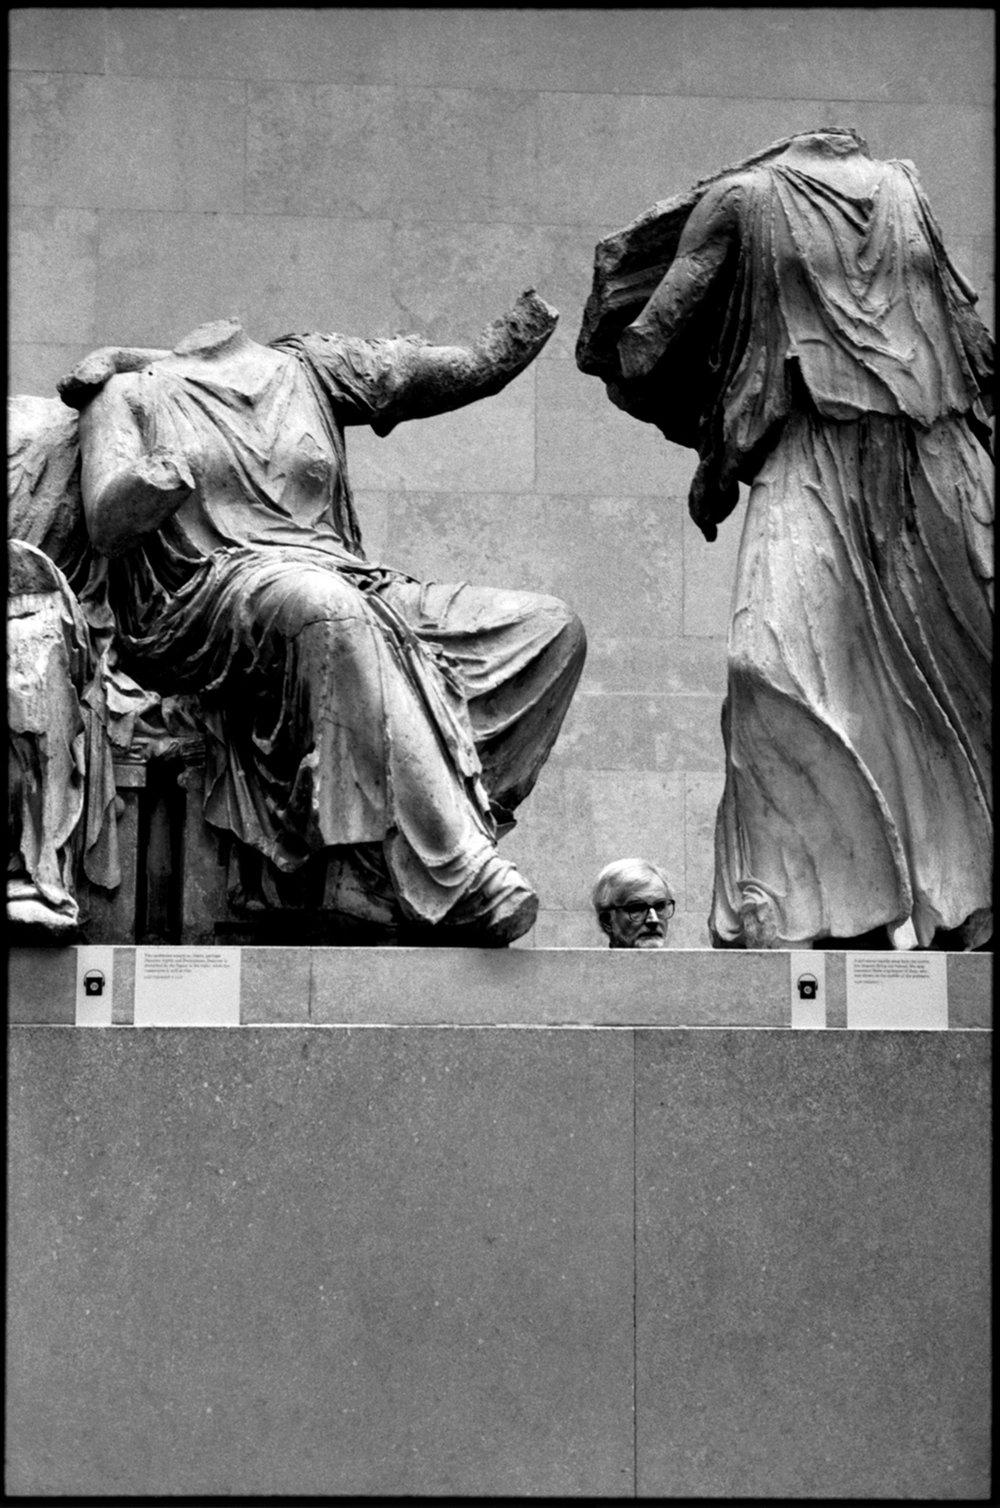 MattStuart_BritishMuseum.JPG